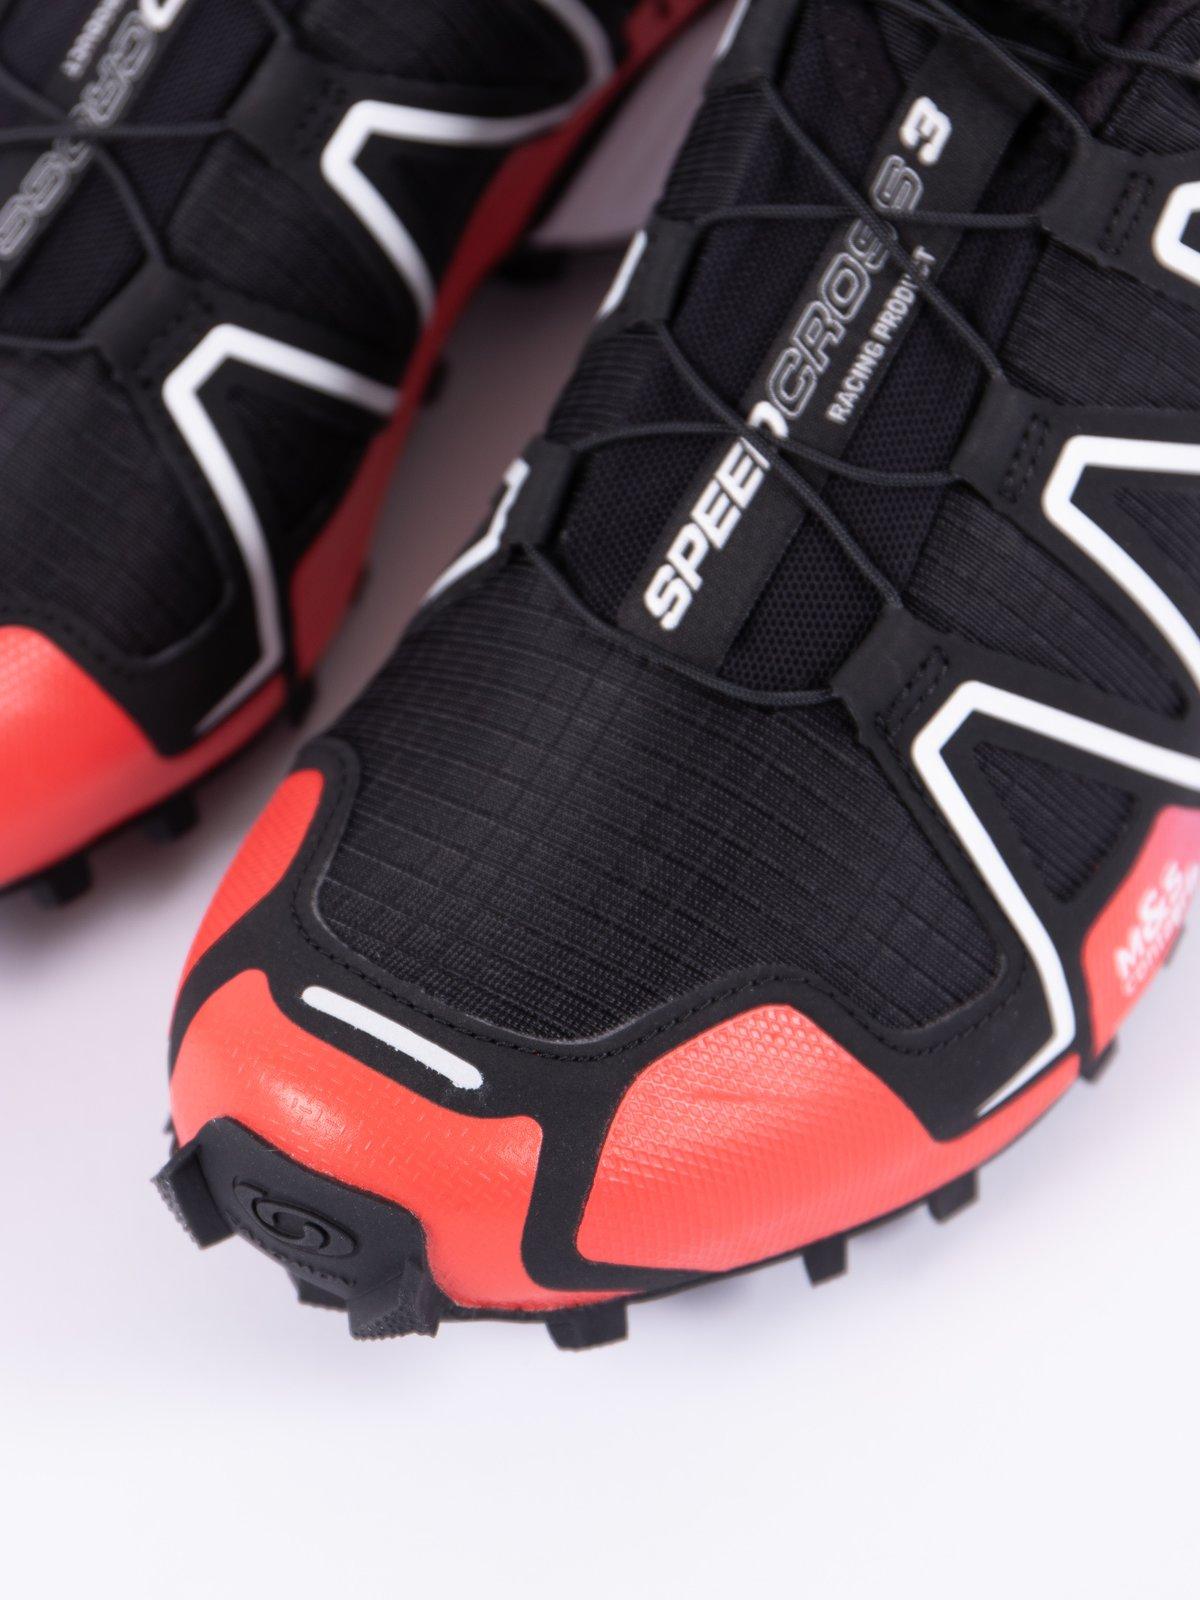 Black/Red/Transcend Blue Speedcross 3 Adv - Image 3